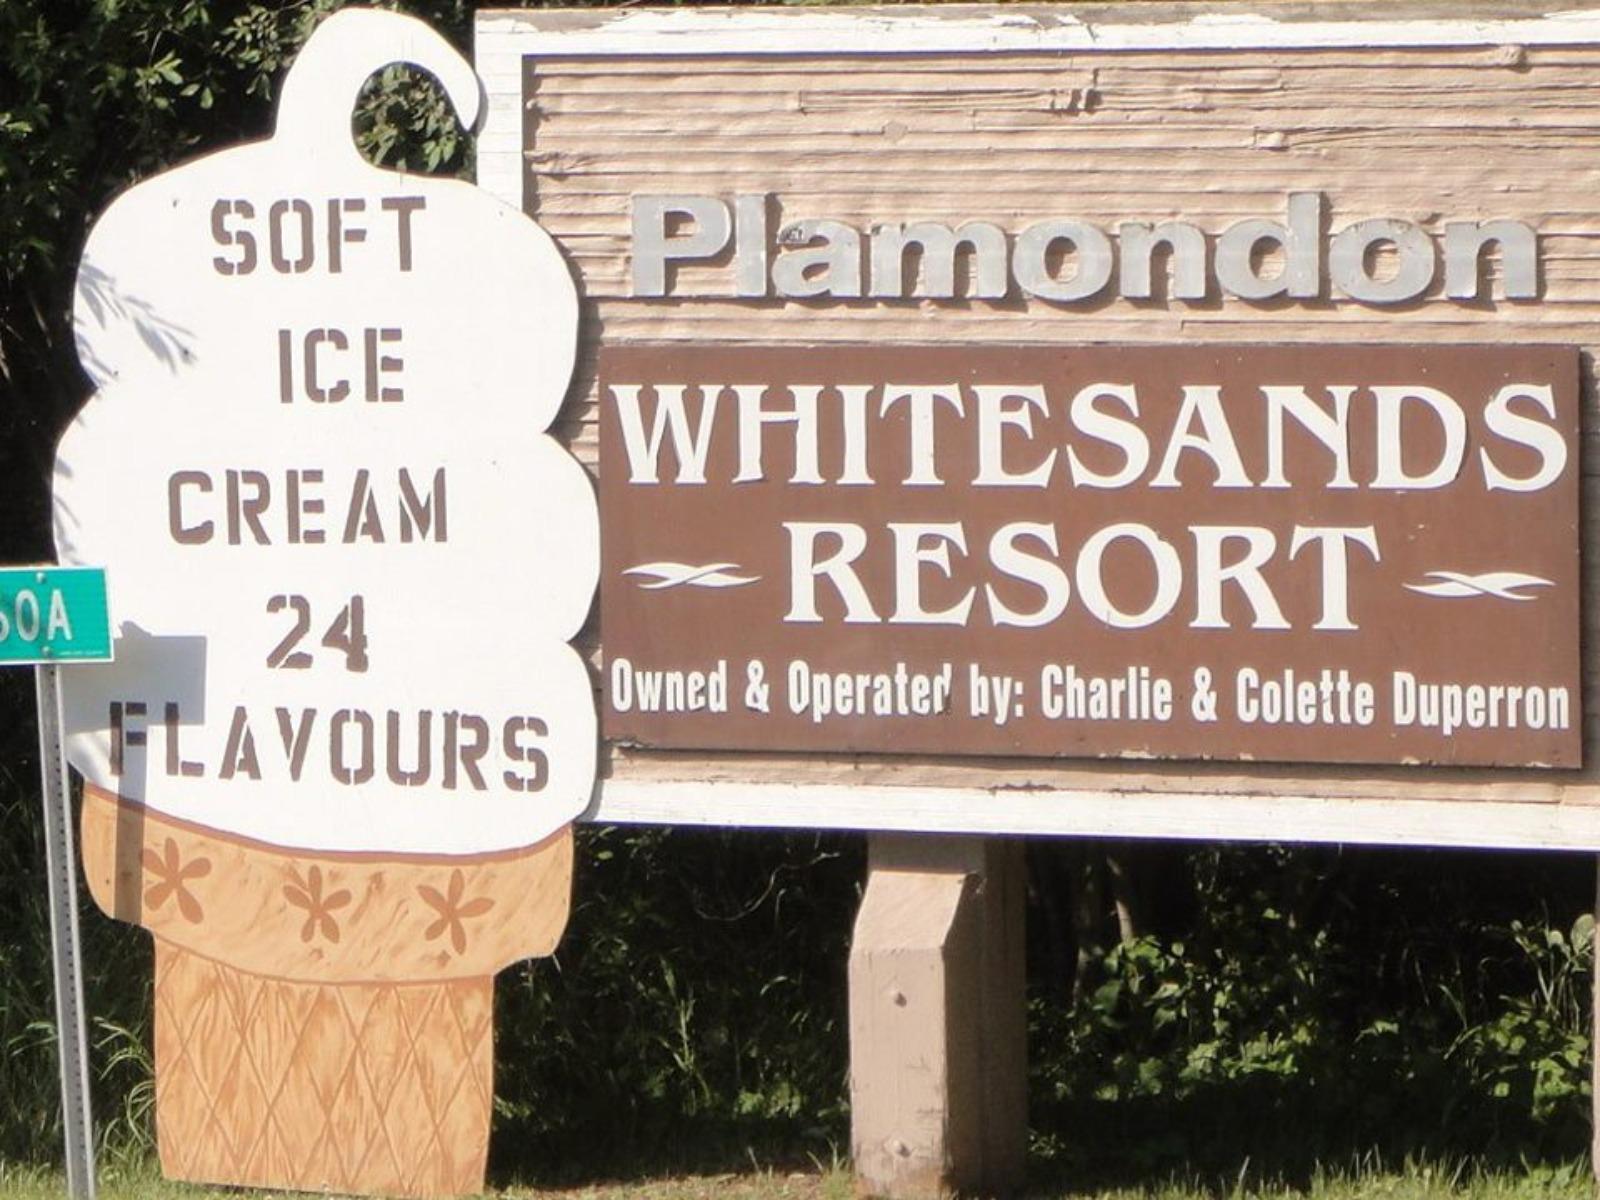 Plamondon Whitesands Resort - Cabins Only